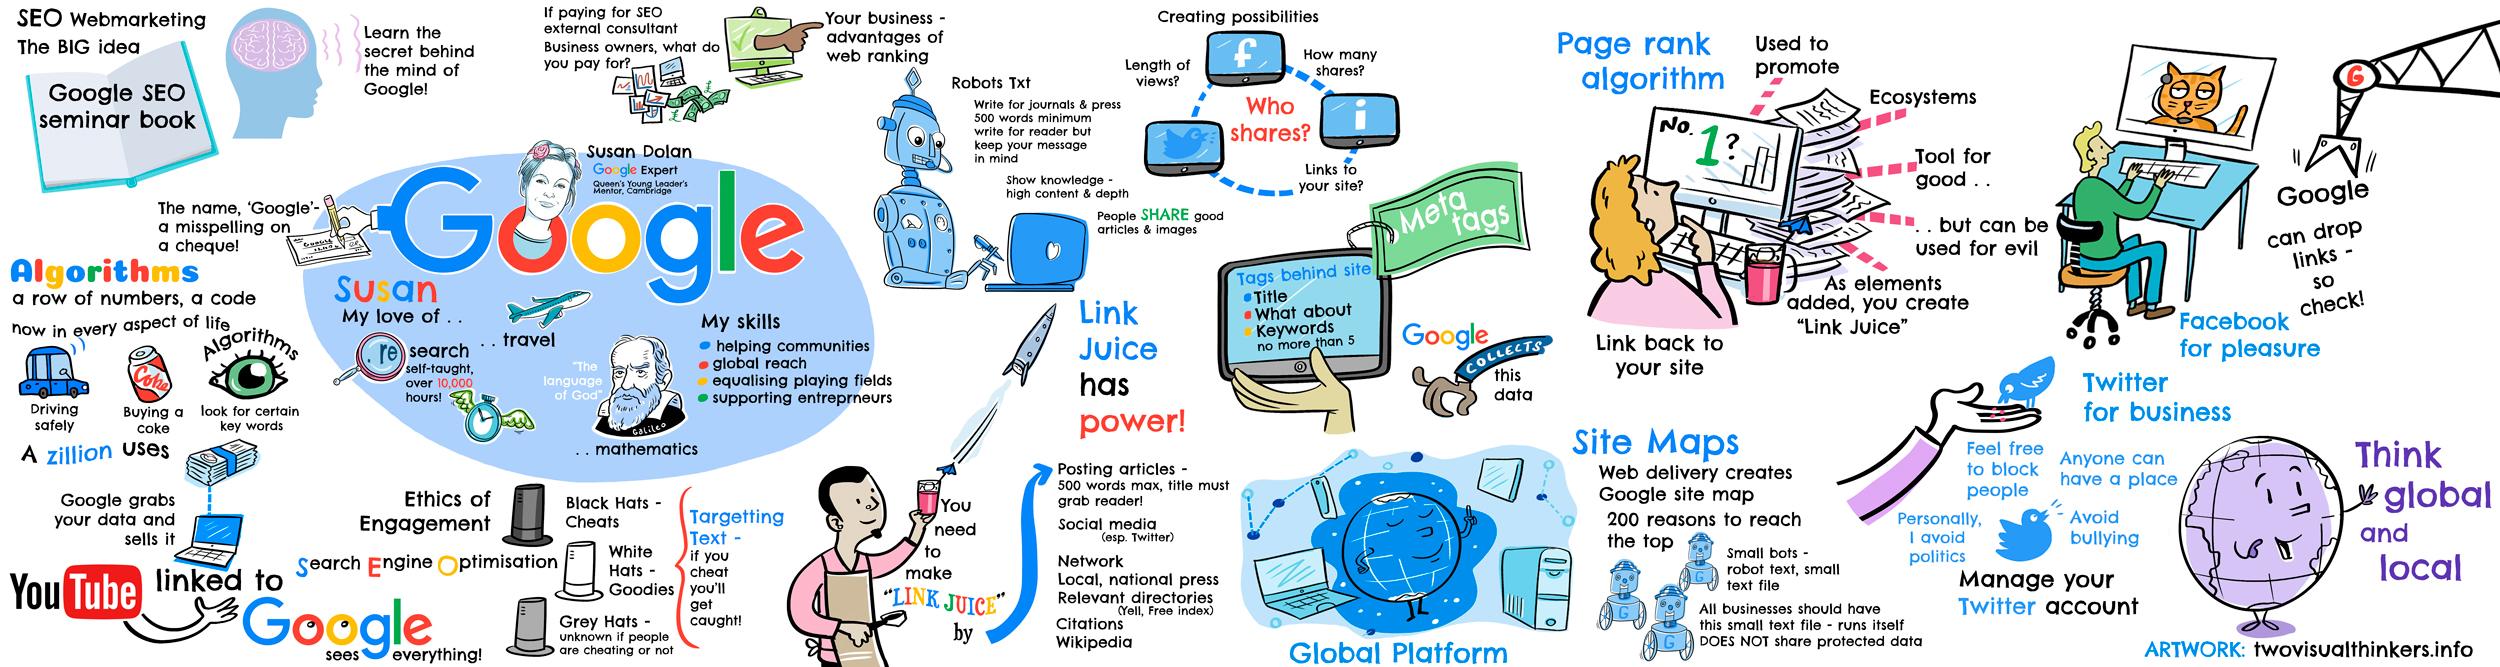 English Susan Dolan Google SEO Expert visualization of thoughts on SEO and social media